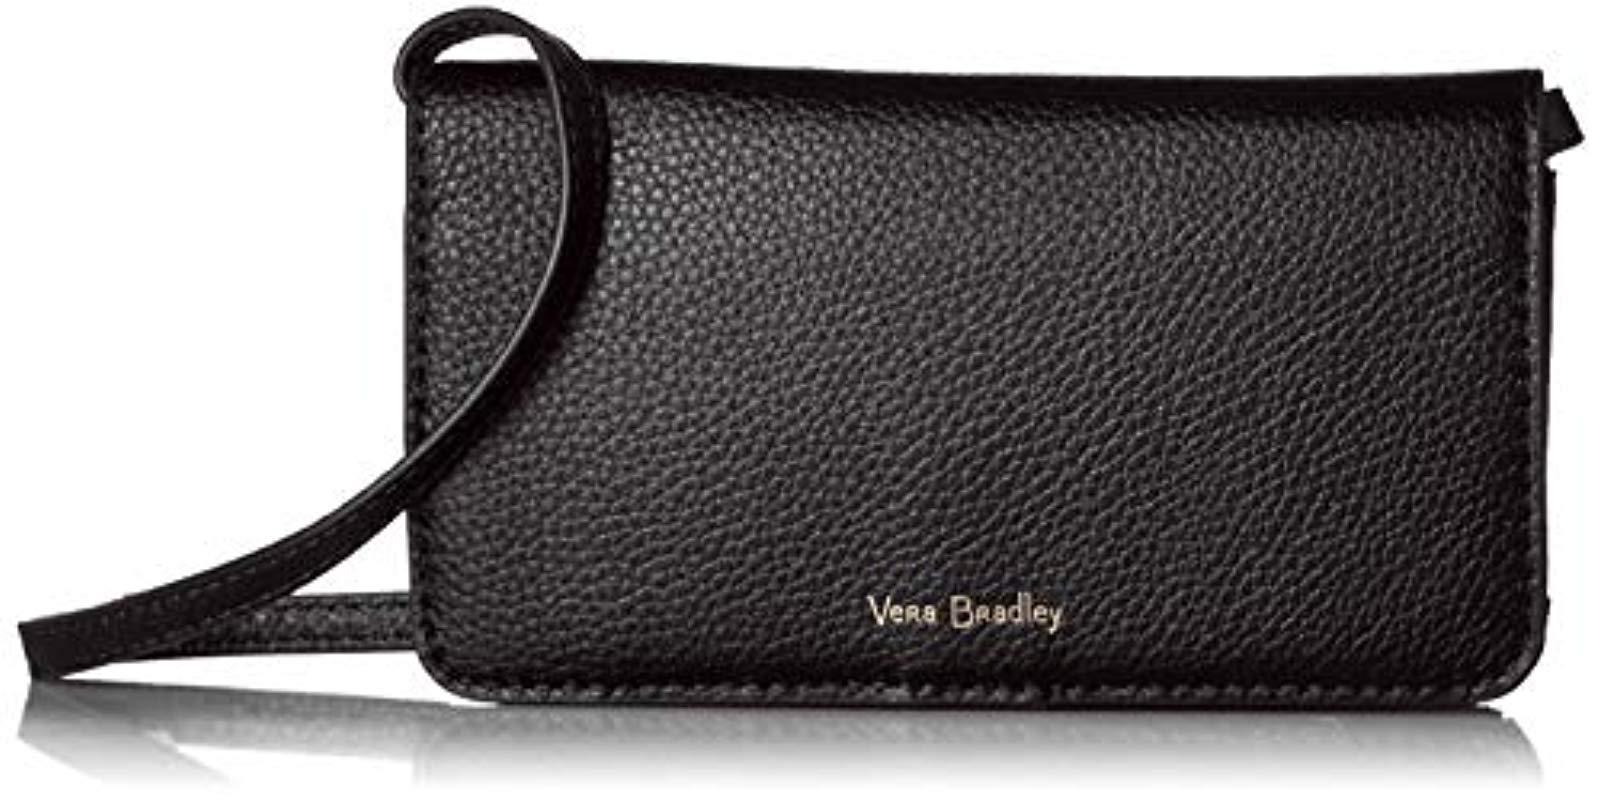 8a82243c4f8b Lyst Vera Bradley Mallory Rfid All Together Crossbody Leather In